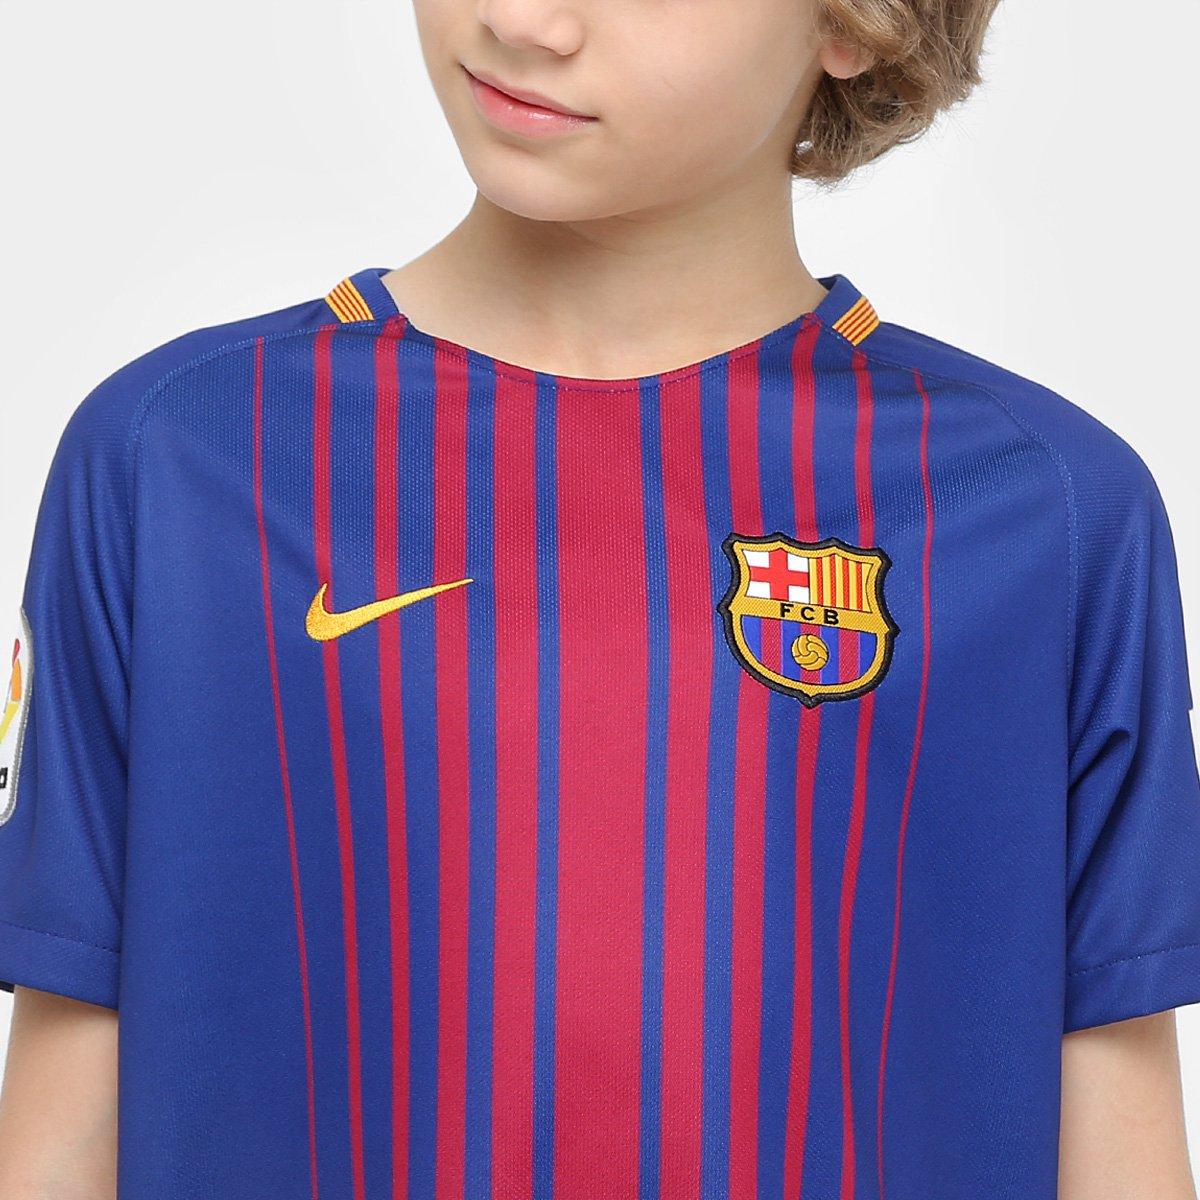 Camisa Barcelona Juvenil Home 17 18 s nº - Torcedor Nike - Compre ... 5bd3818002edd